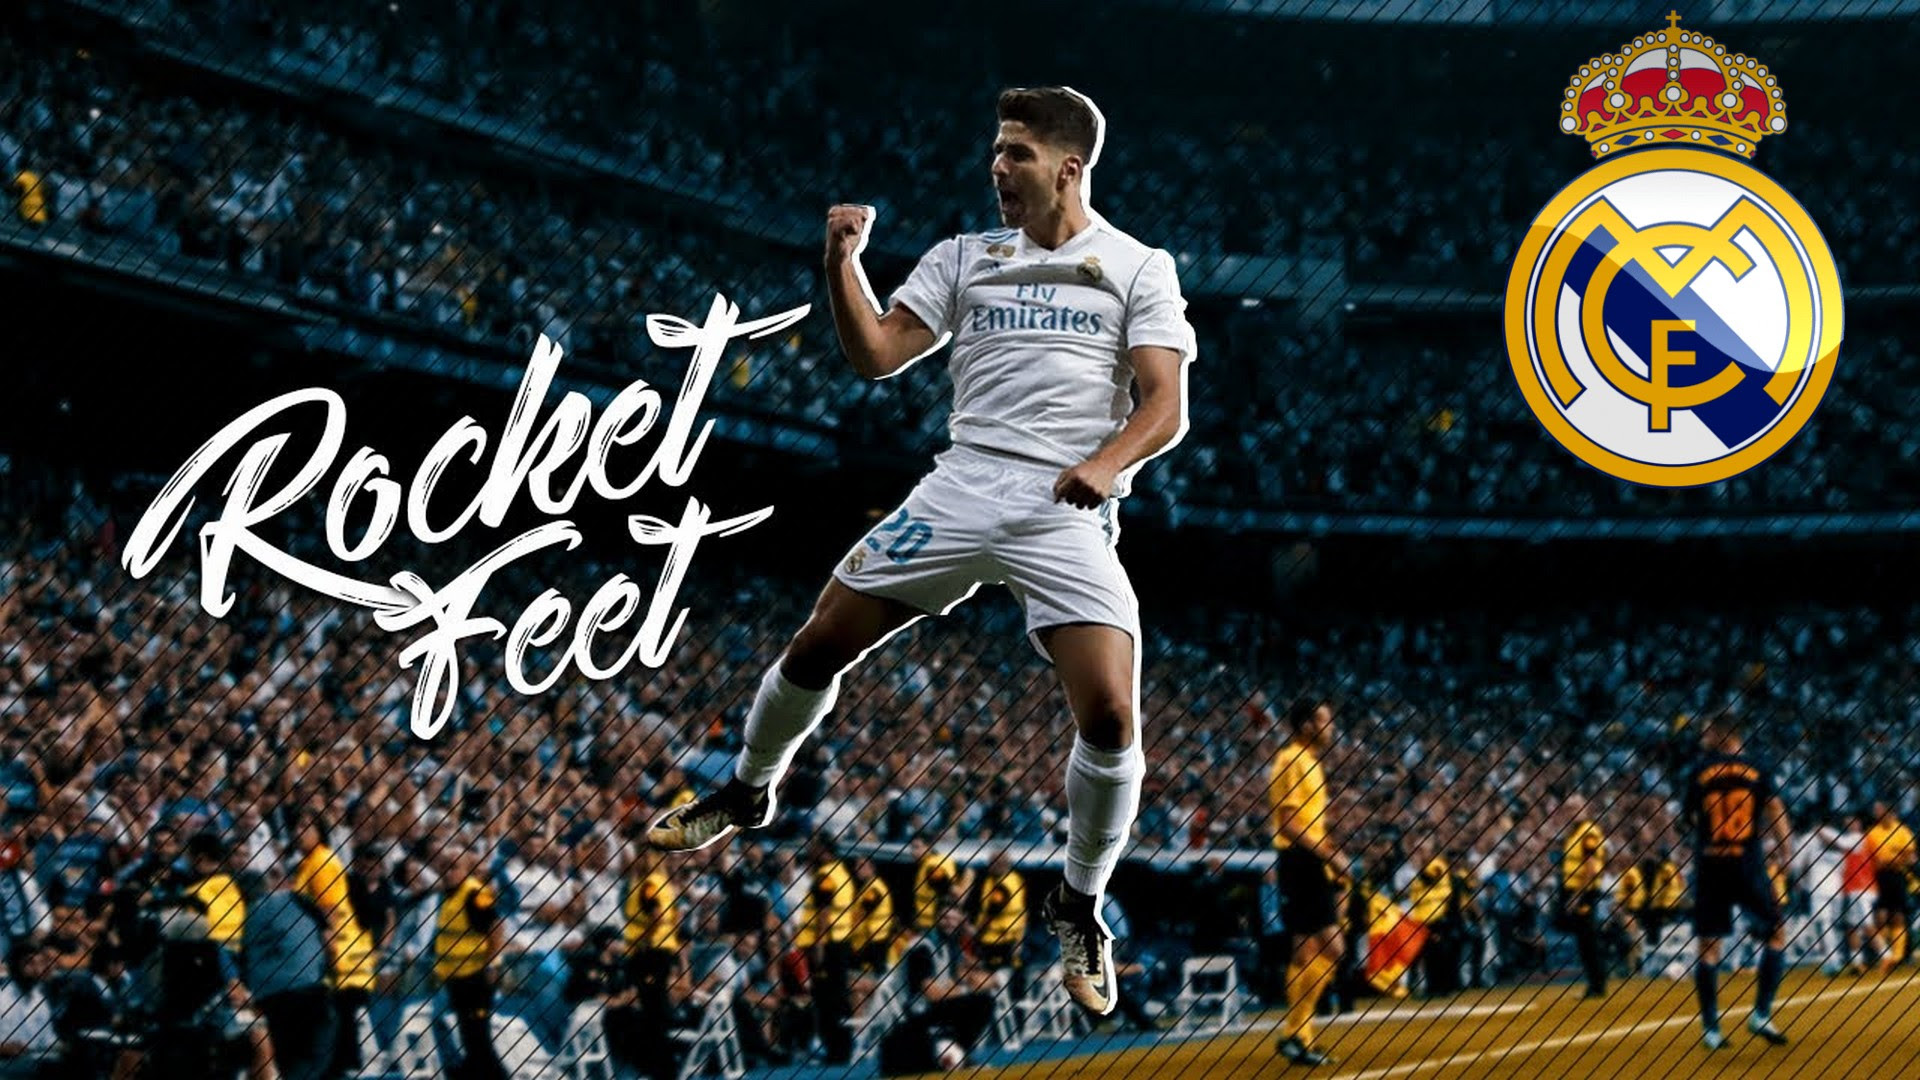 Marco Asensio Real Madrid Wallpaper HD | 2019 Football ...